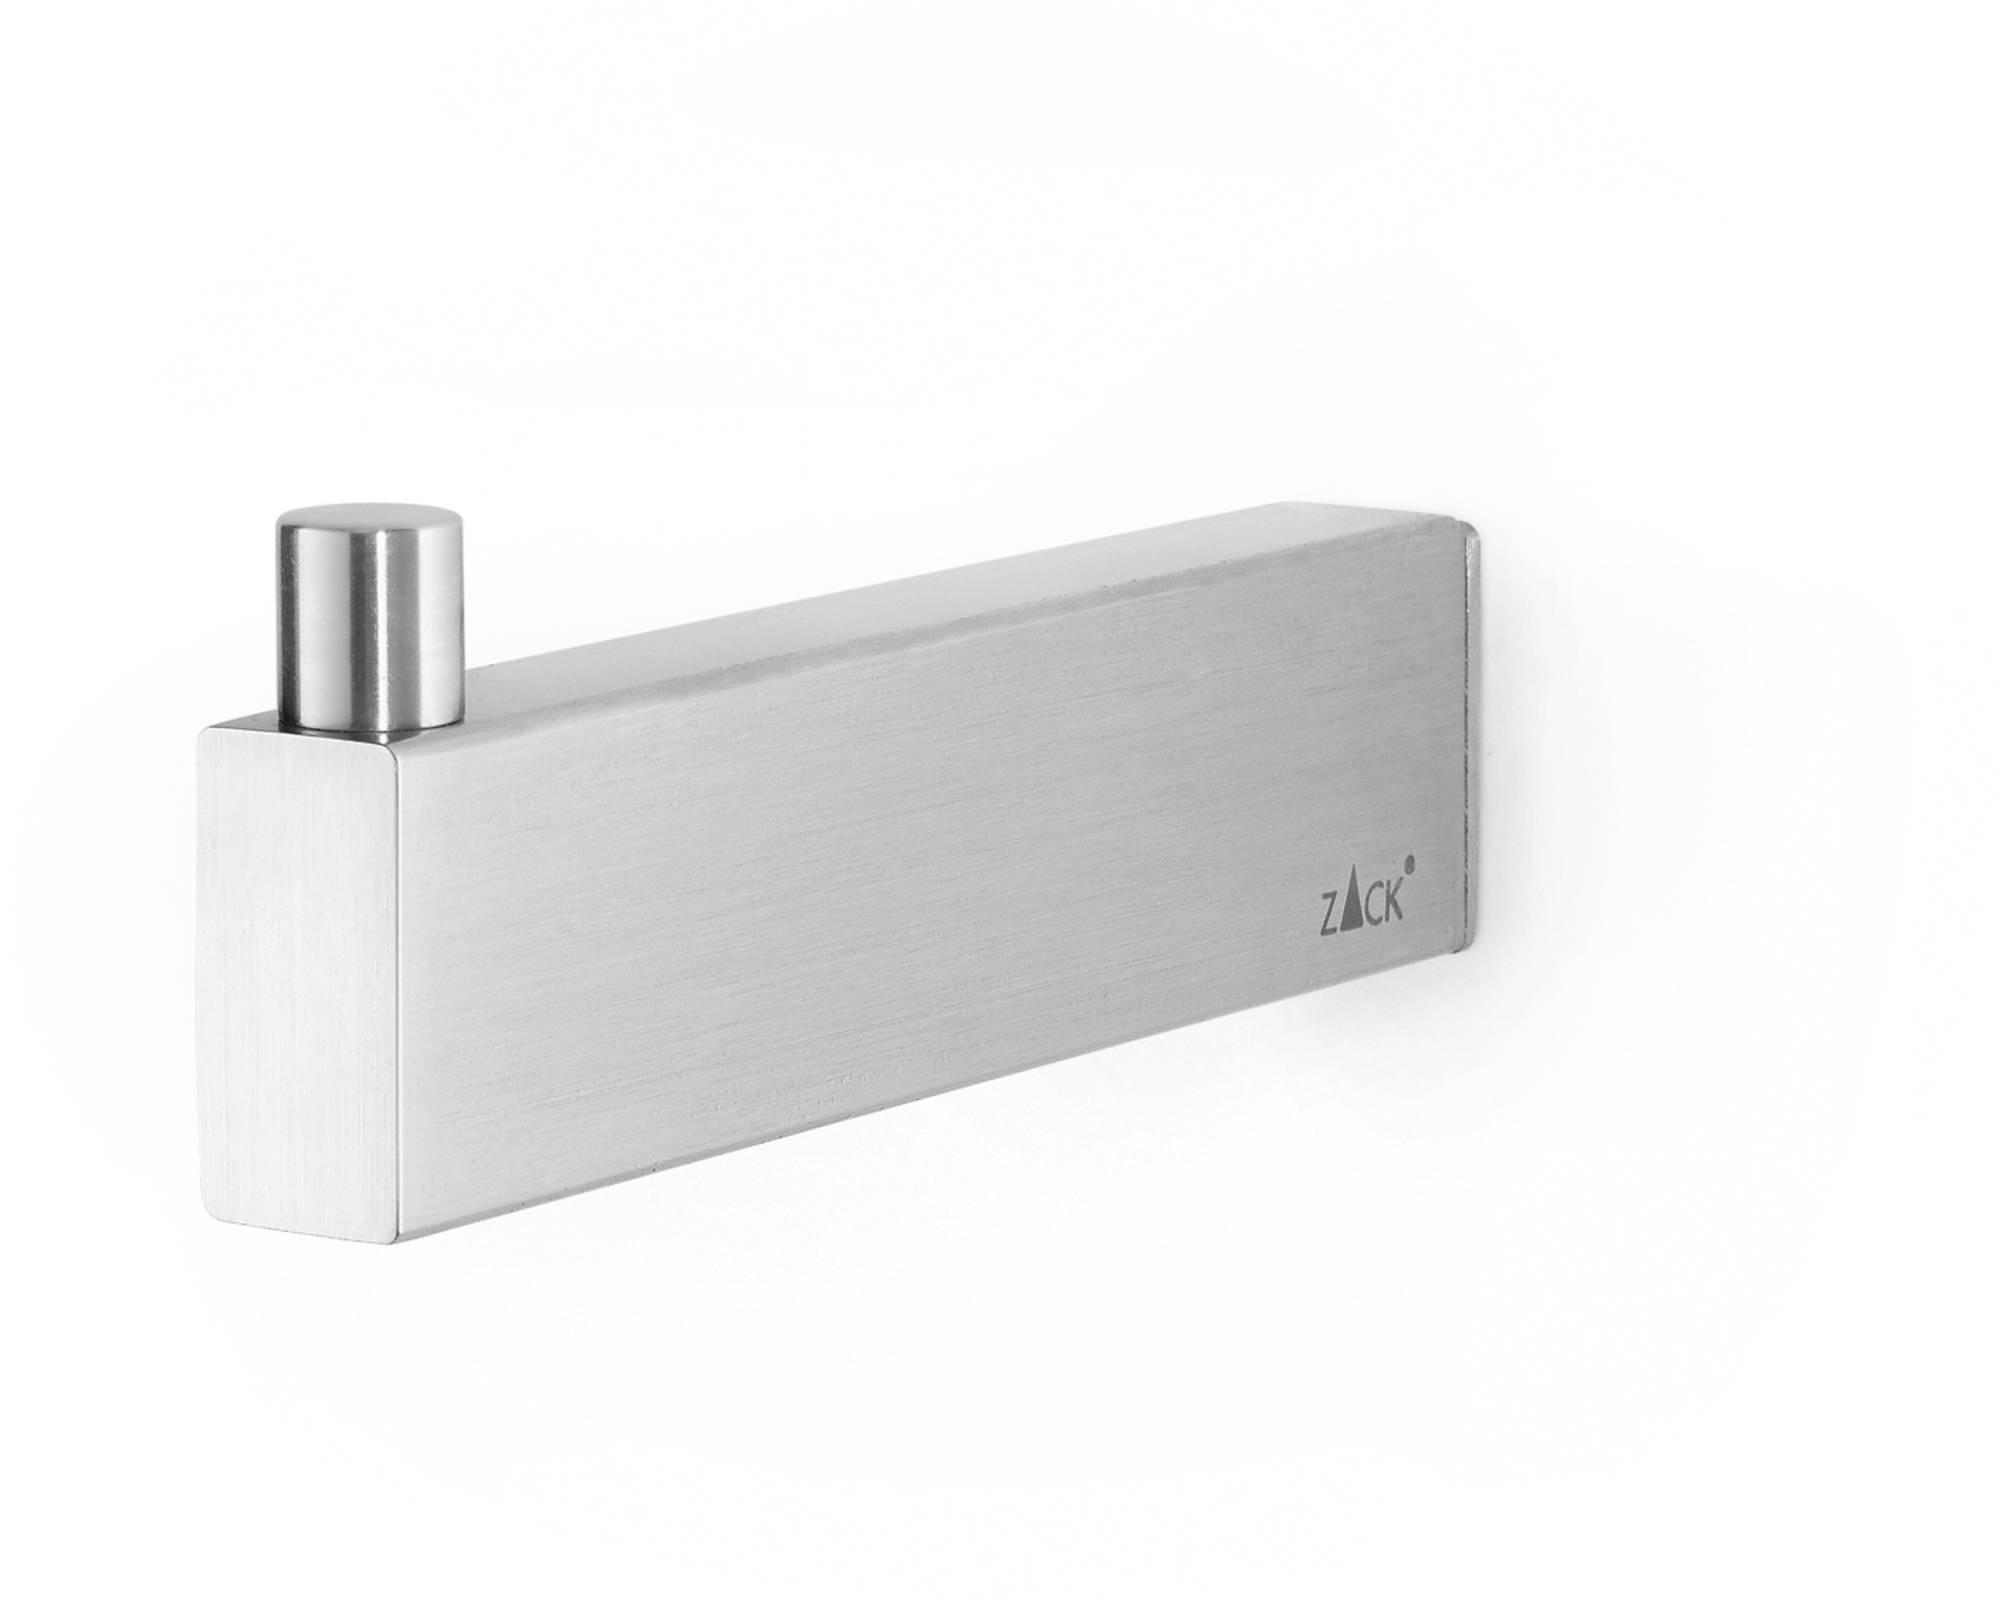 ZACK Linea (reserve-) toiletrolhouder